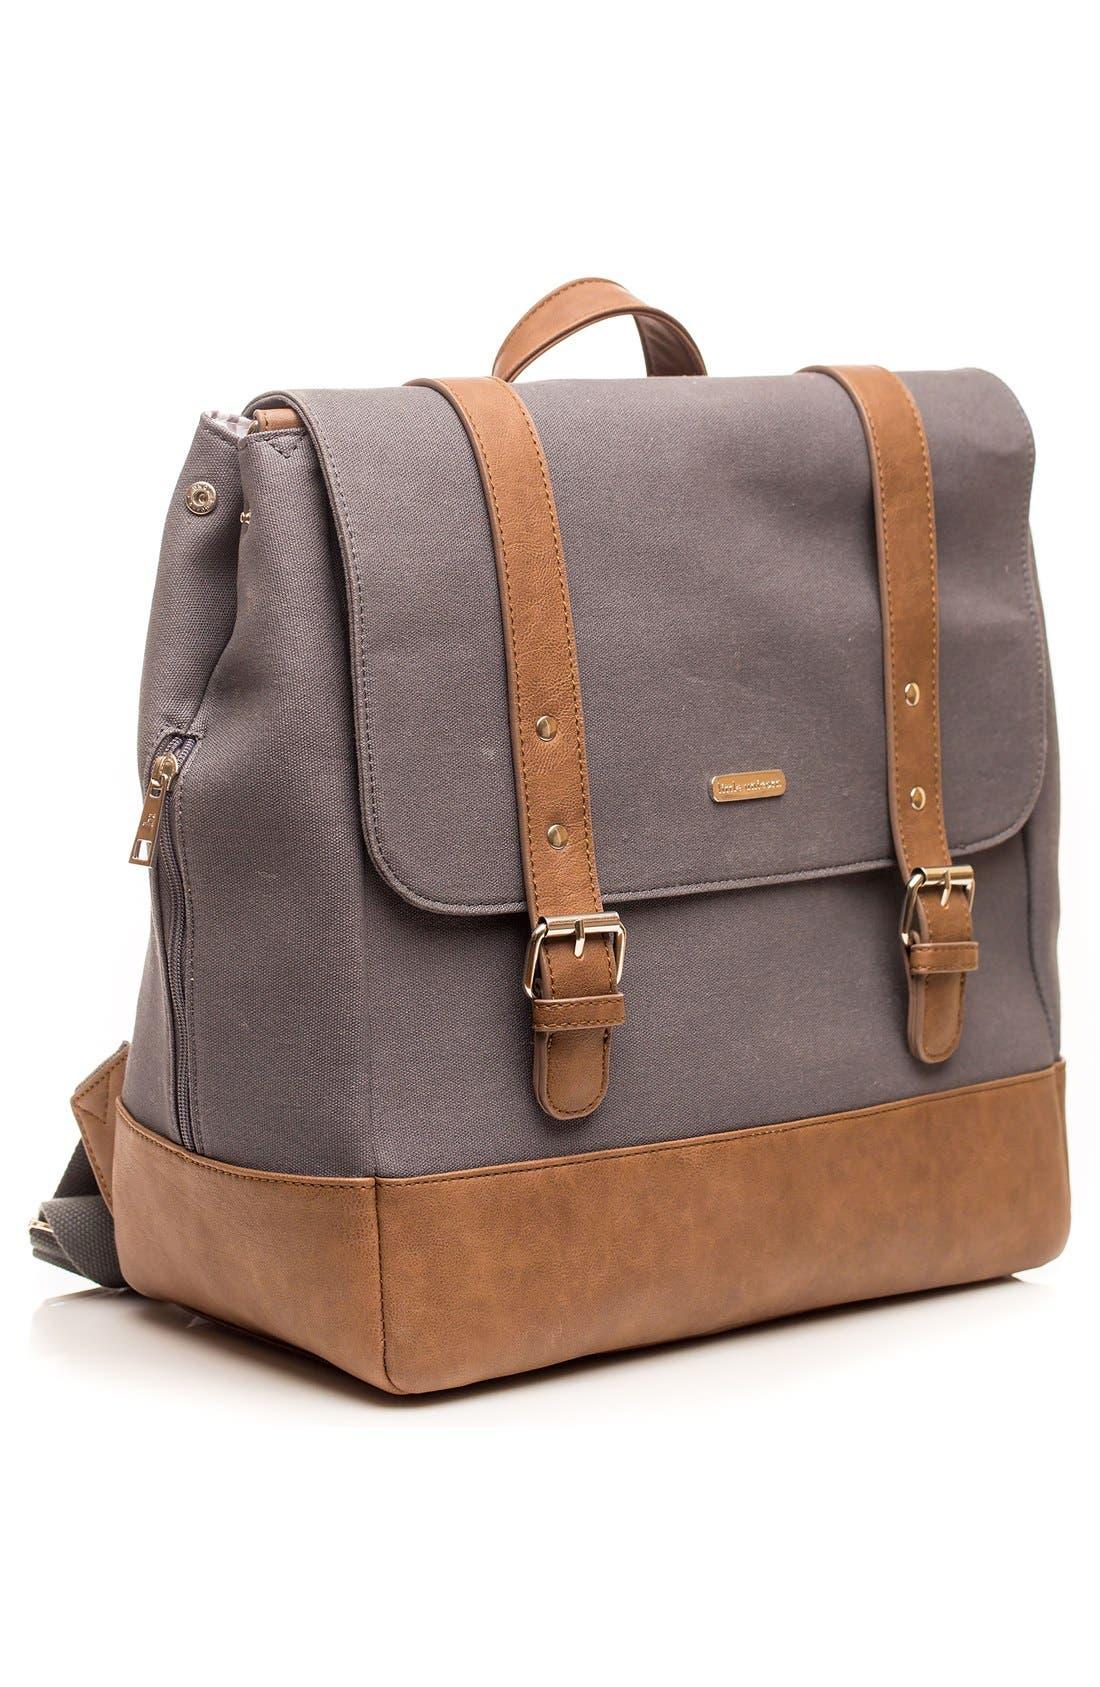 Marindale Diaper Backpack,                             Alternate thumbnail 3, color,                             Grey